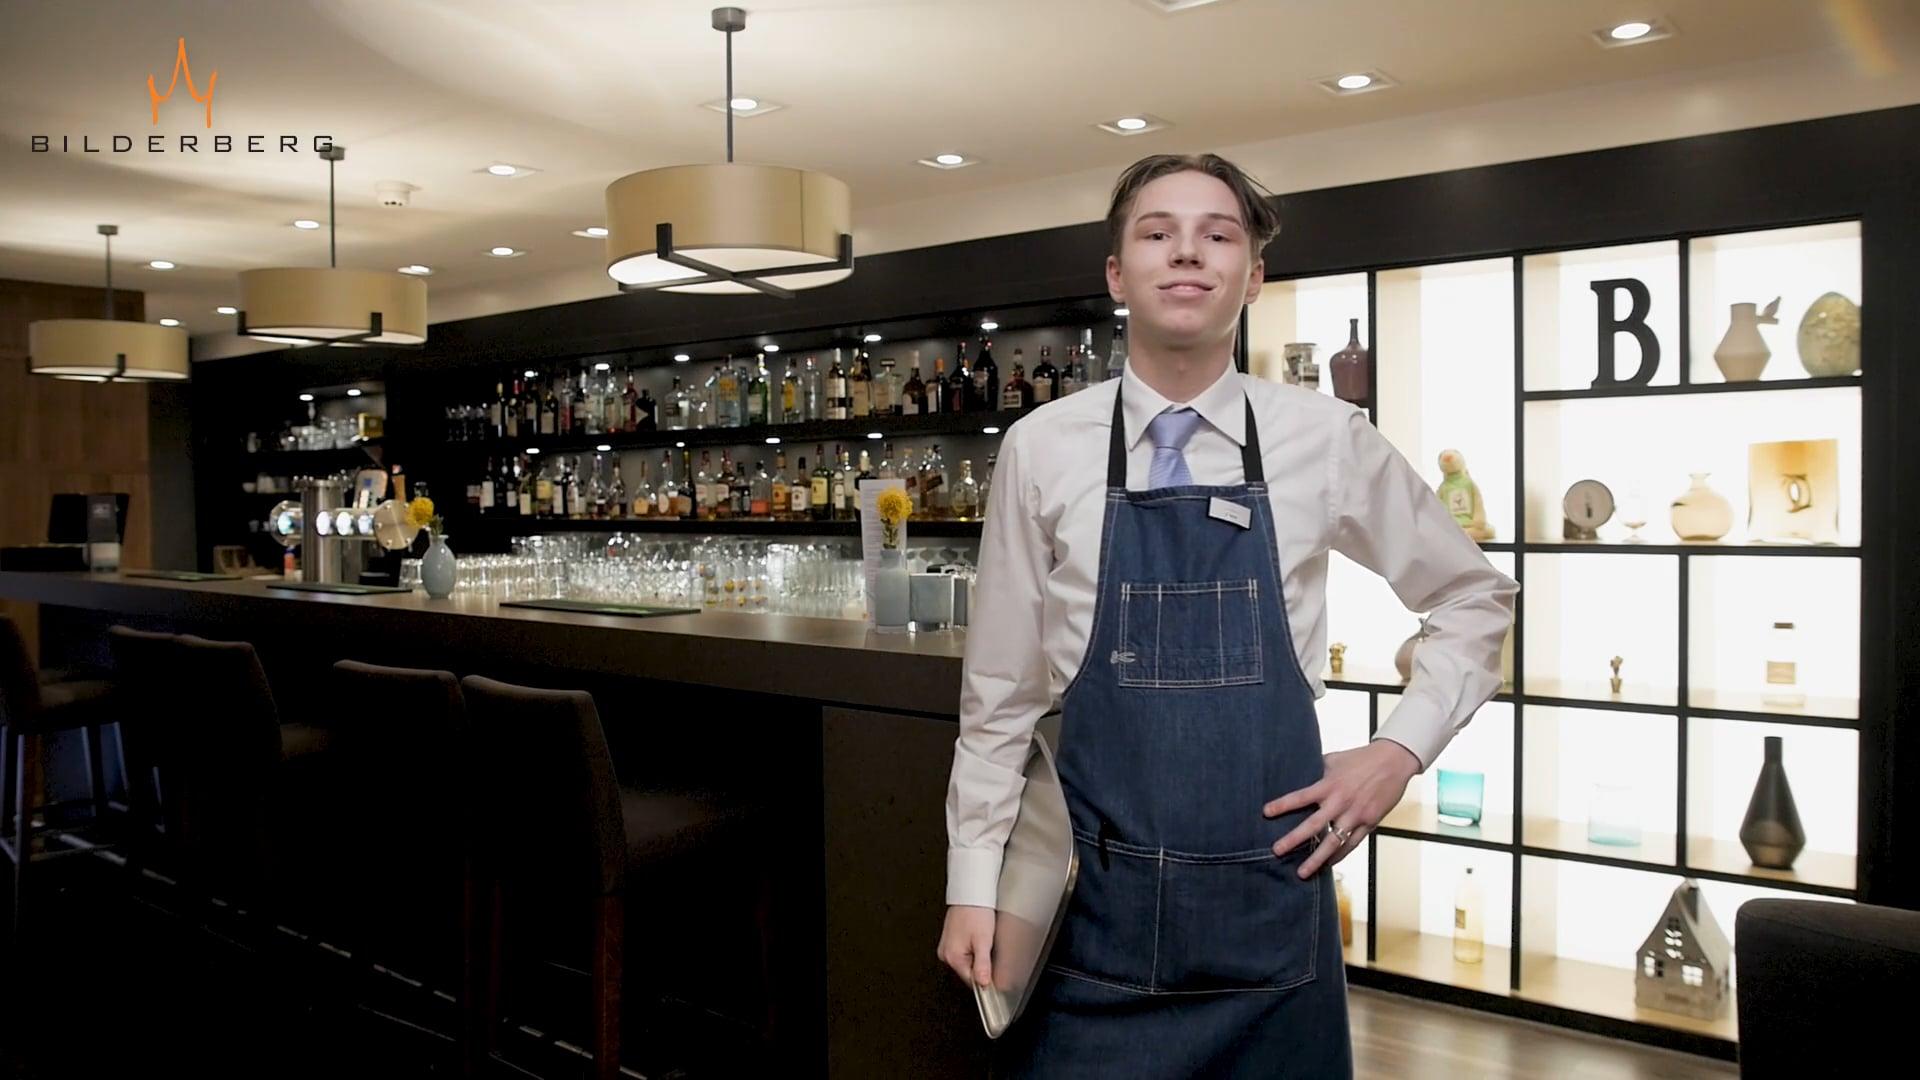 'Young' Bilderberg Hotels